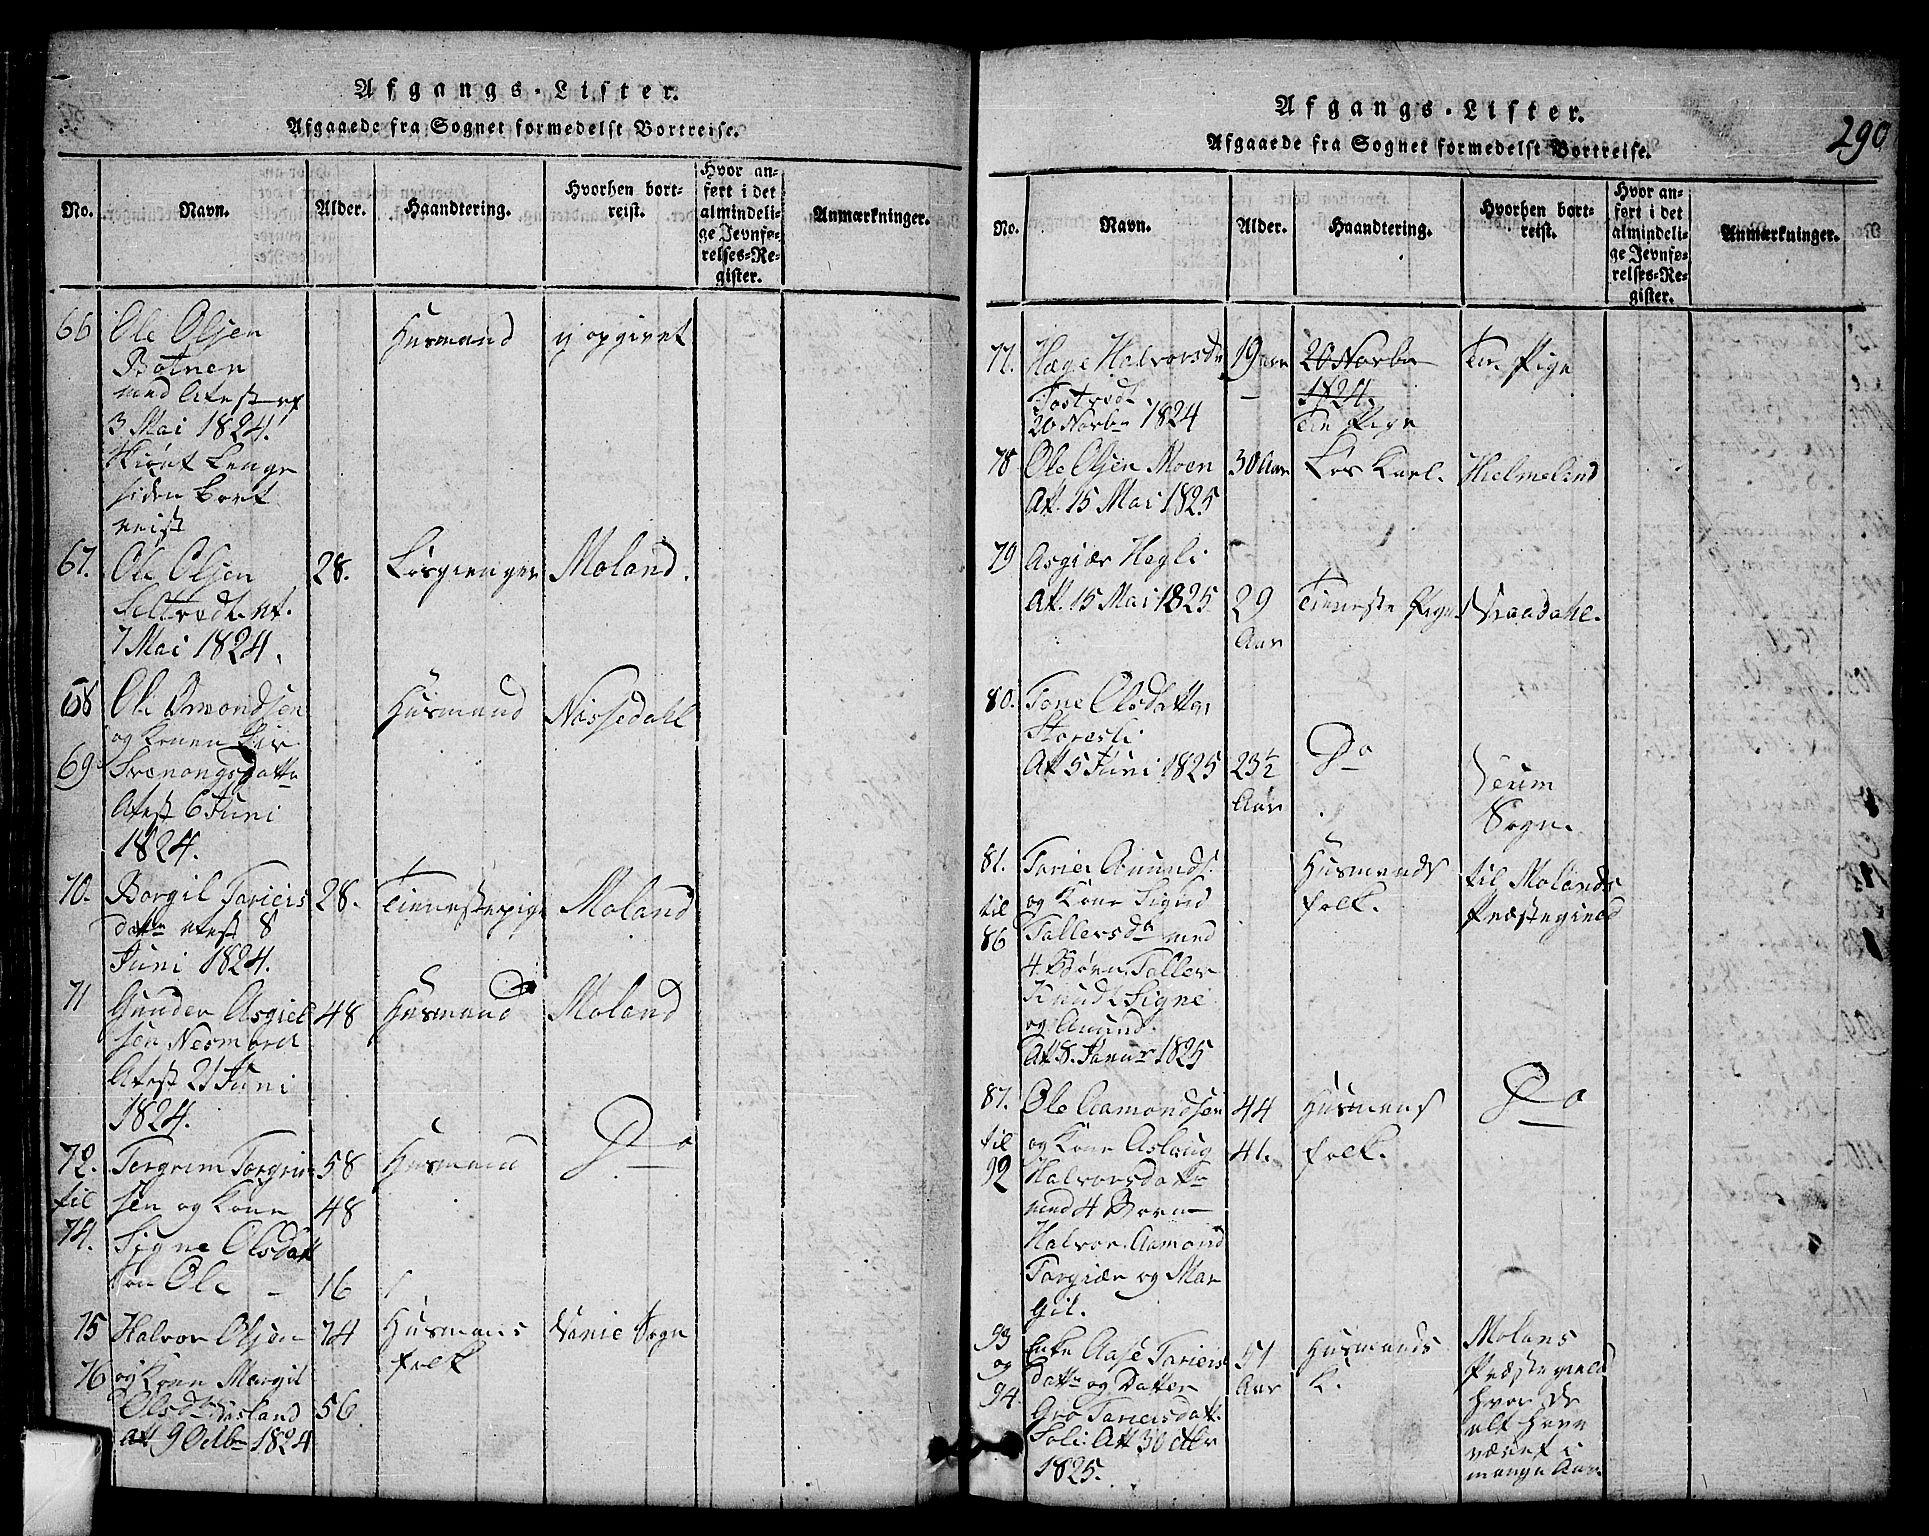 SAKO, Mo kirkebøker, G/Gb/L0001: Klokkerbok nr. II 1, 1814-1843, s. 290